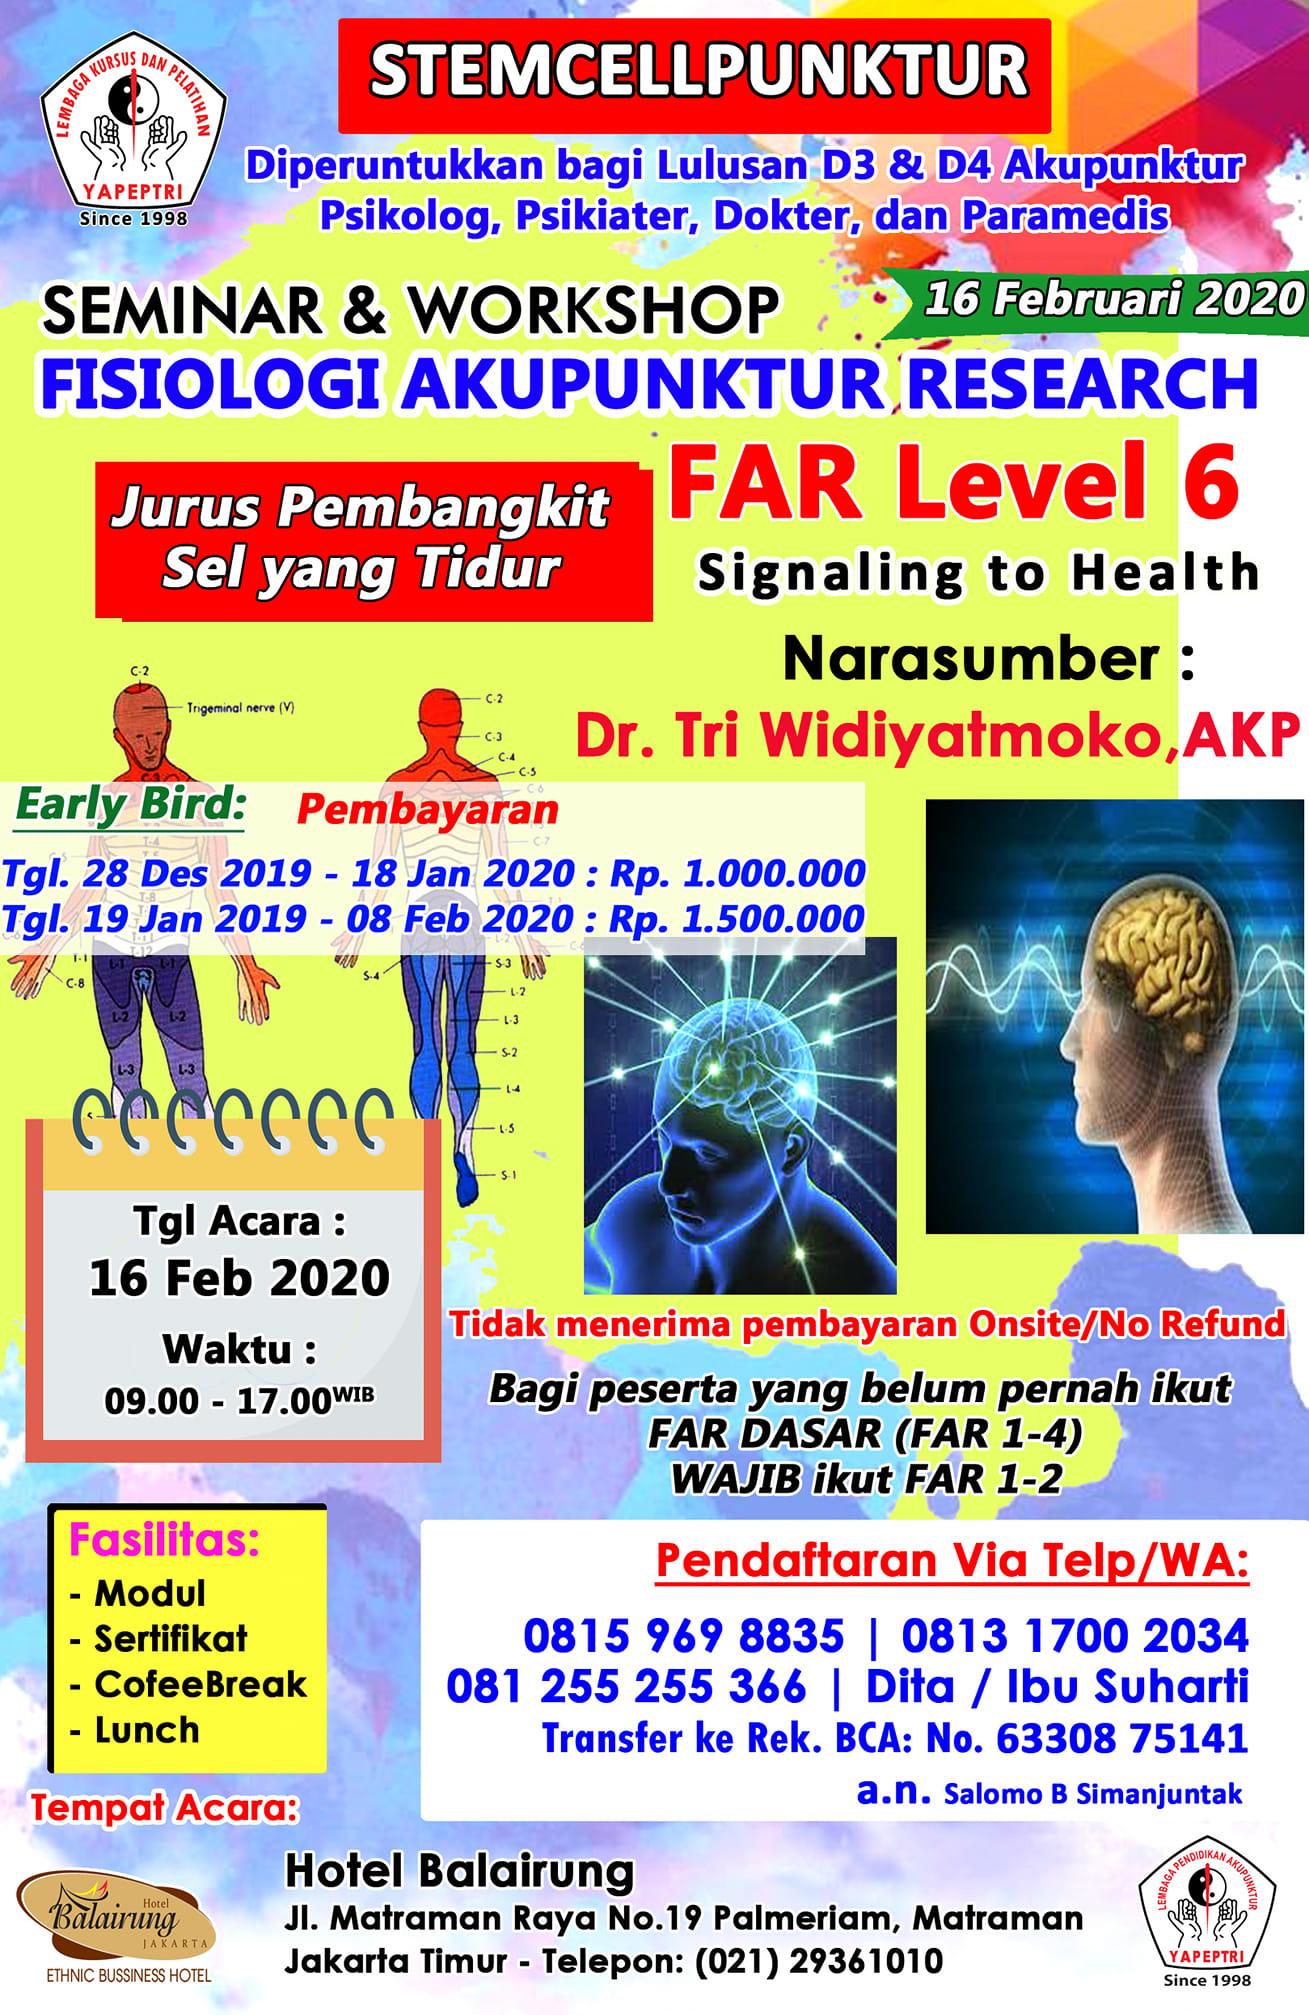 Seminar & Workshop Fisiologi Akupunktur Research (FAR Level 6)